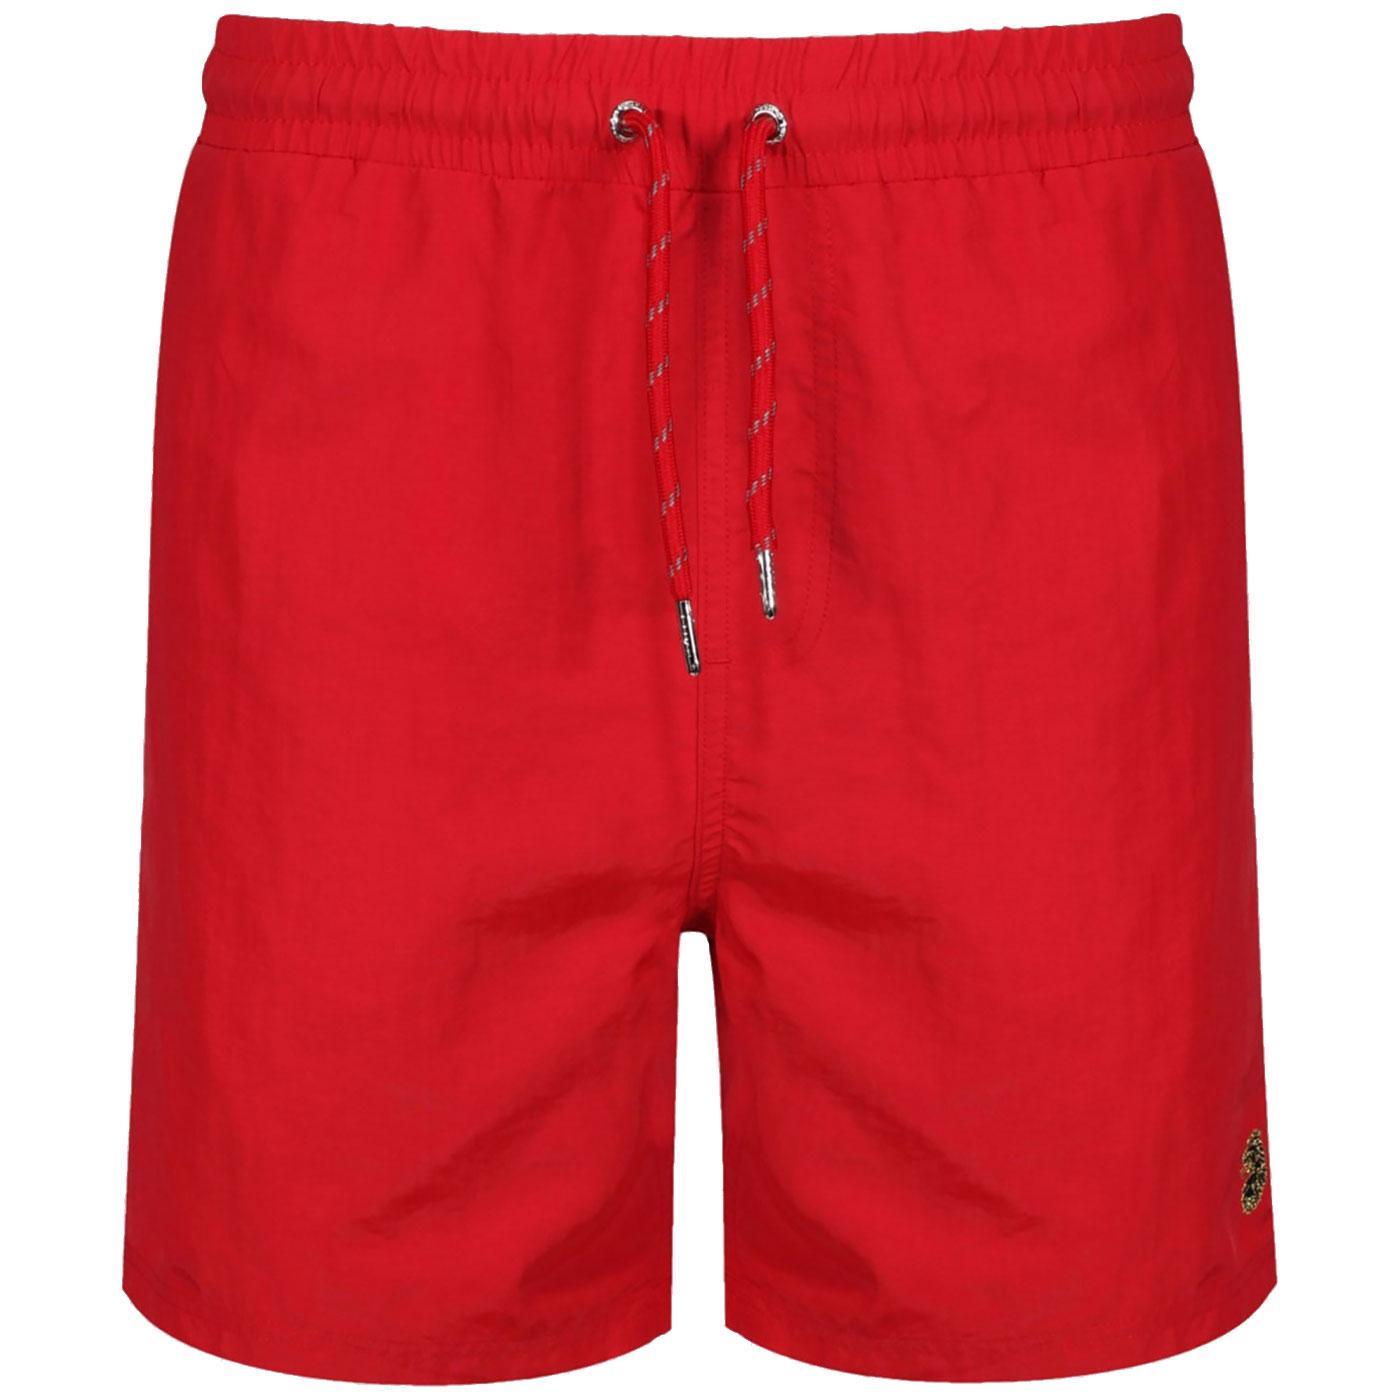 Great LUKE SPORT Mens Retro Swim Shorts TECH RED